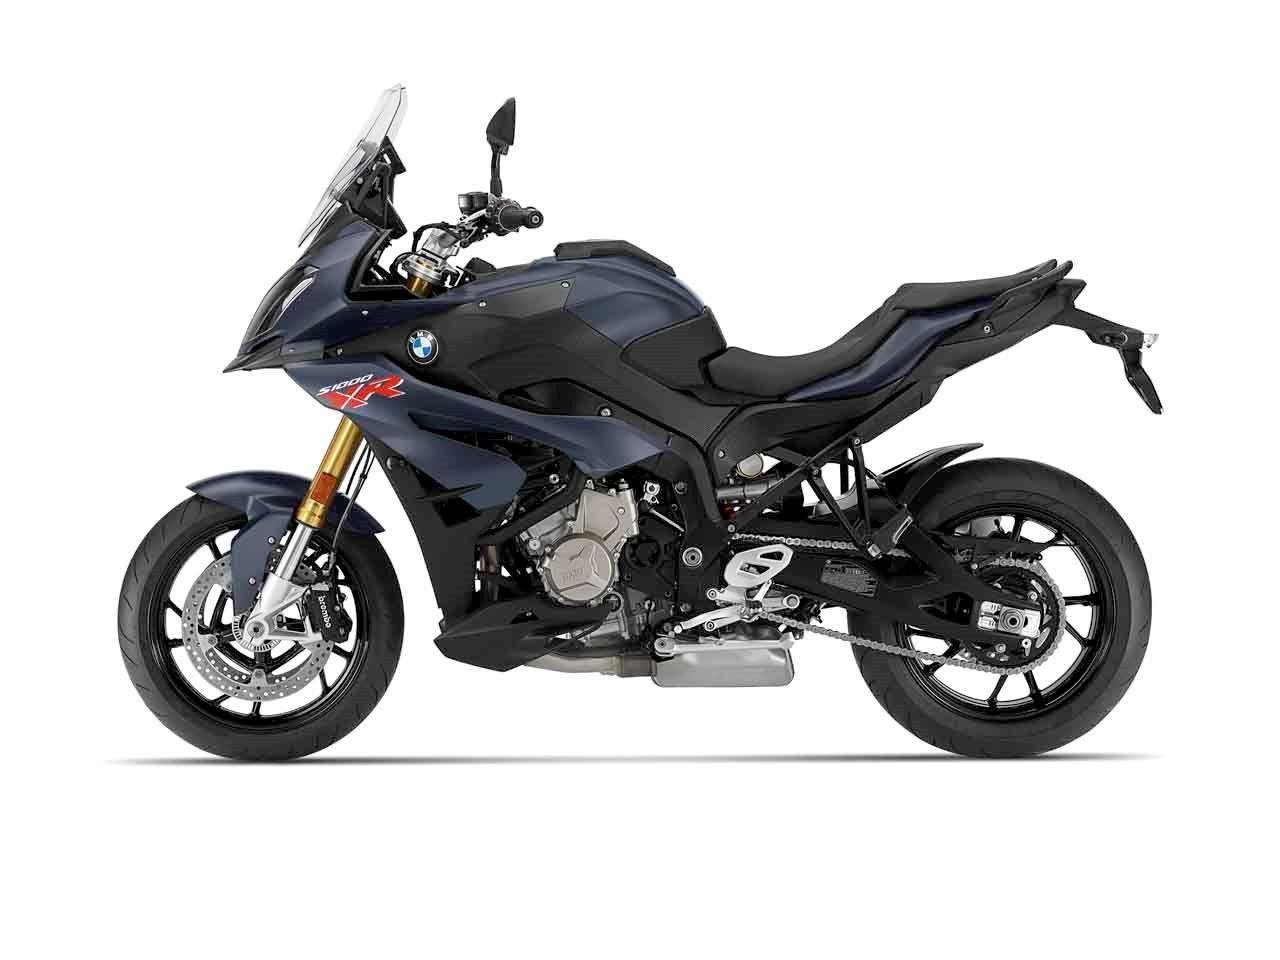 moto neuve acheter bmw s 1000 xr abs arrigoni sport gmbh. Black Bedroom Furniture Sets. Home Design Ideas